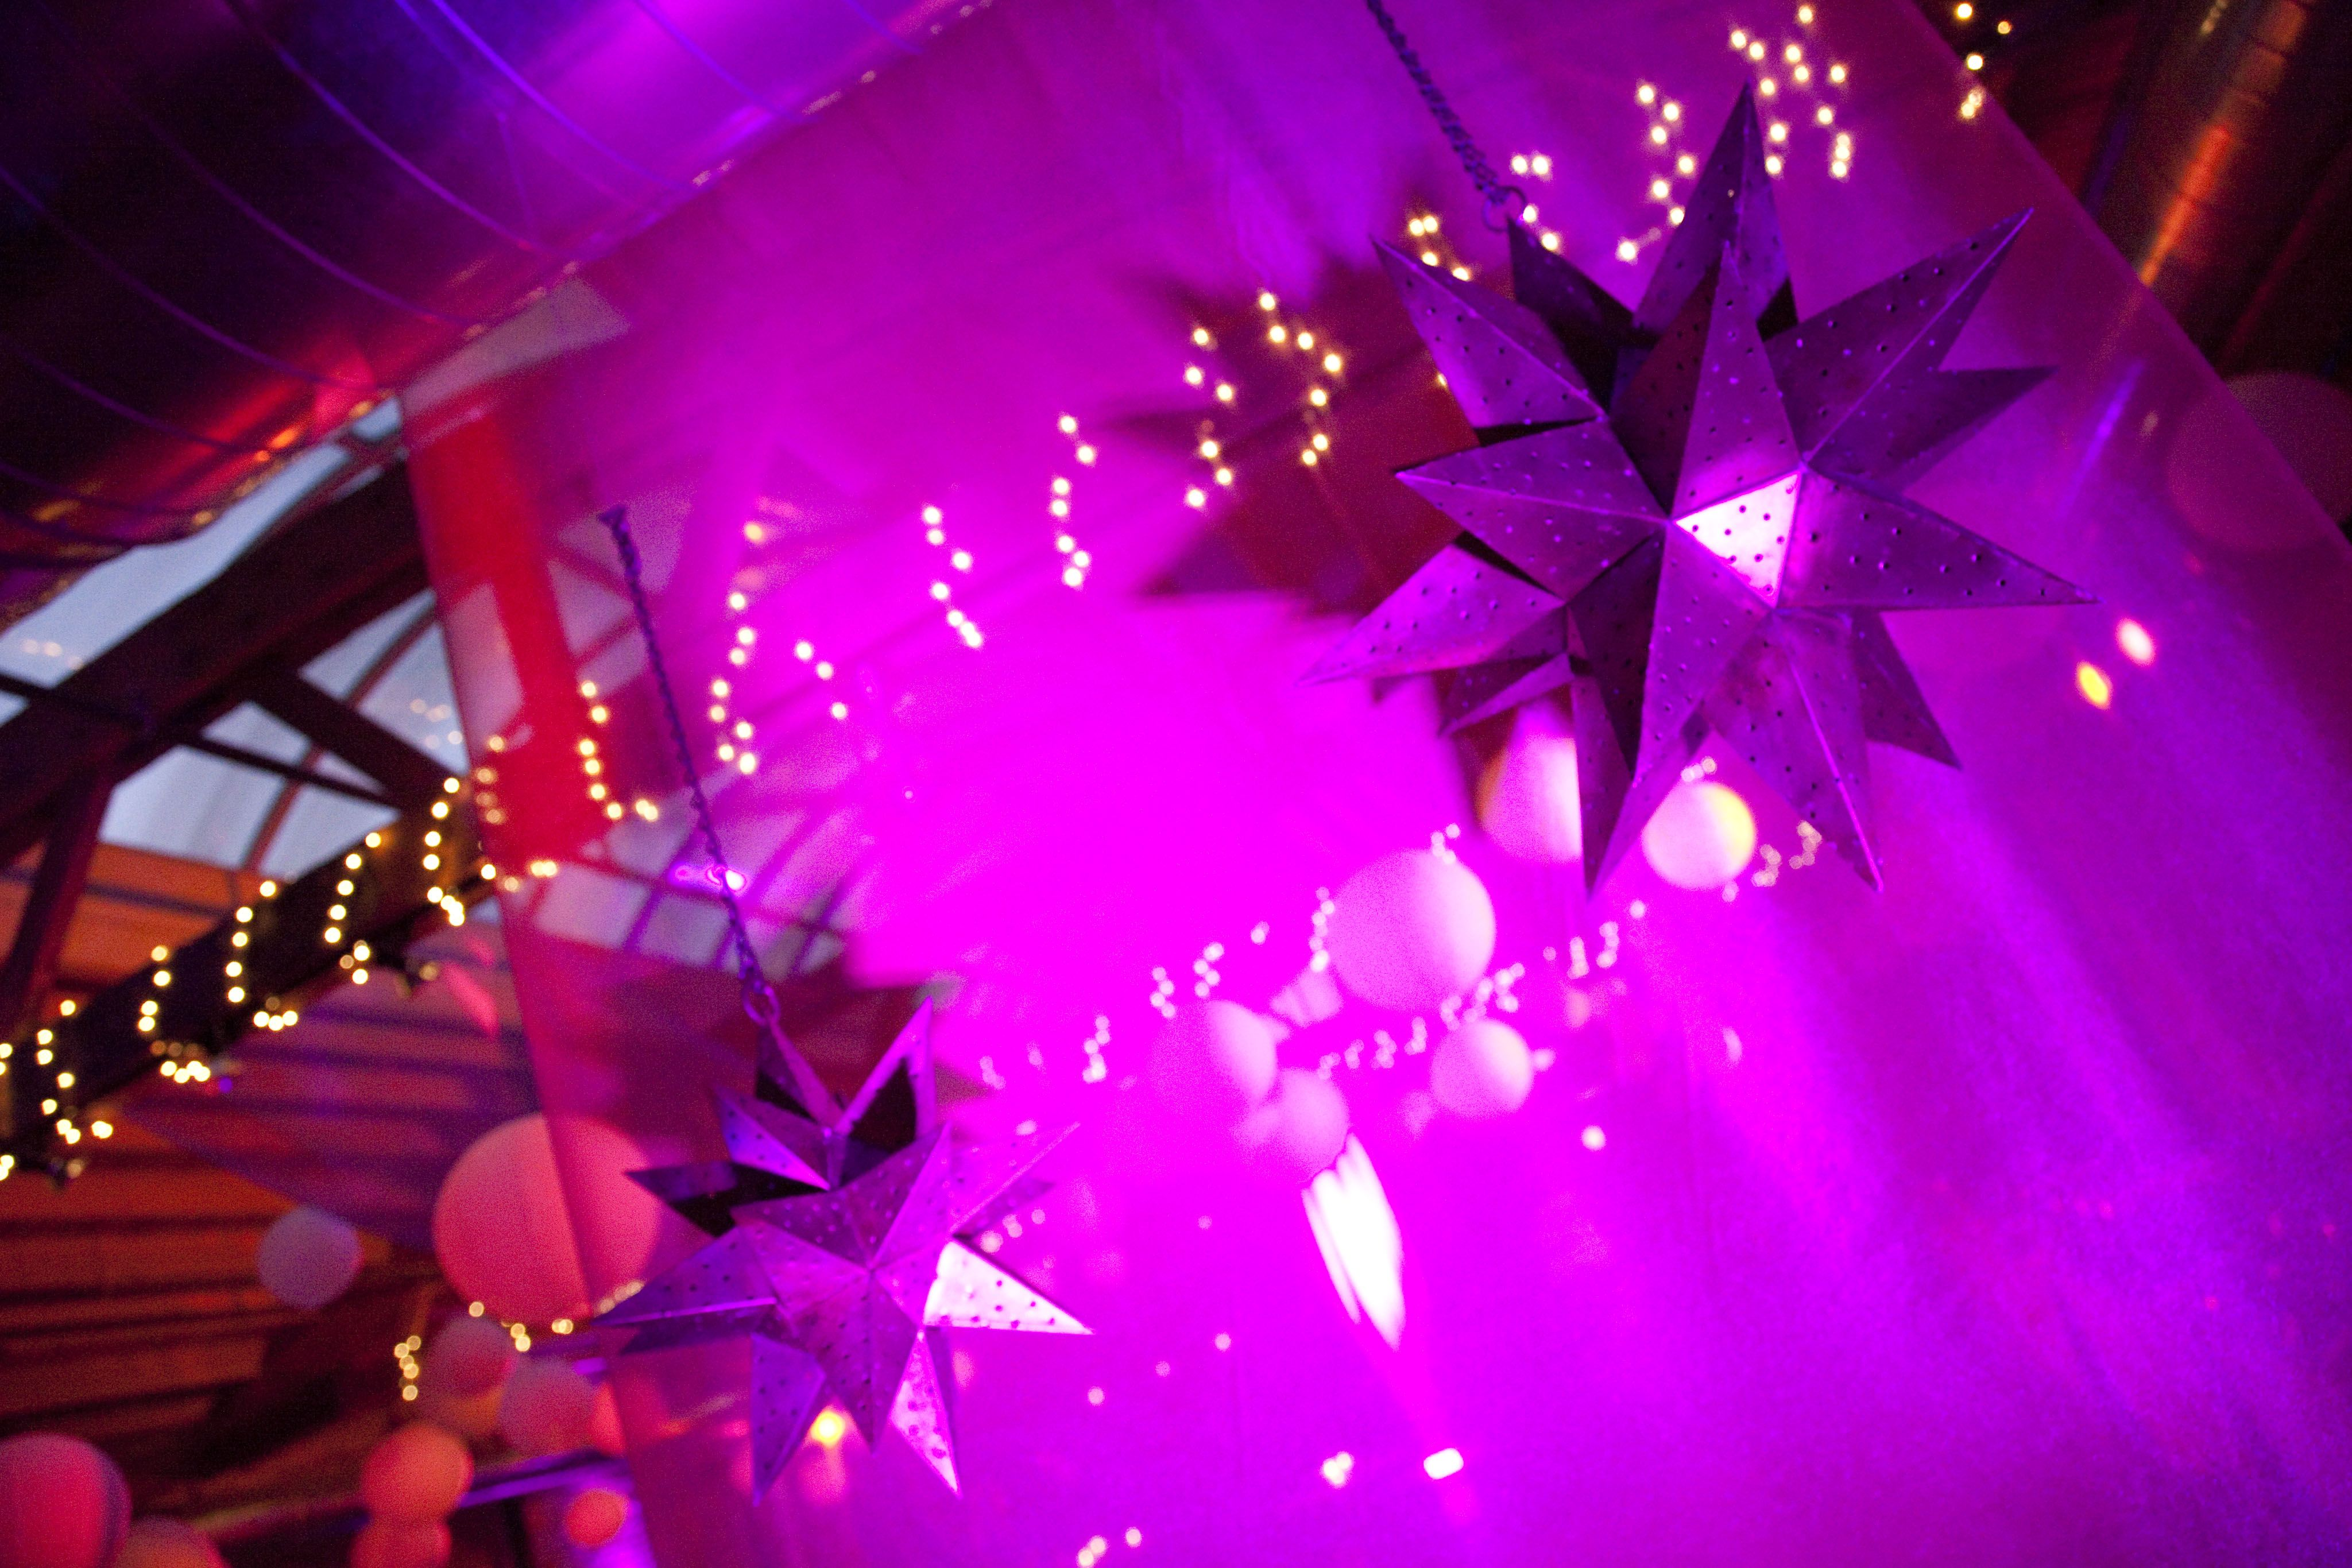 Wedding stage decoration with balloons  Sangeet purple stars lights  Indian Weddings  Pinterest  Creative